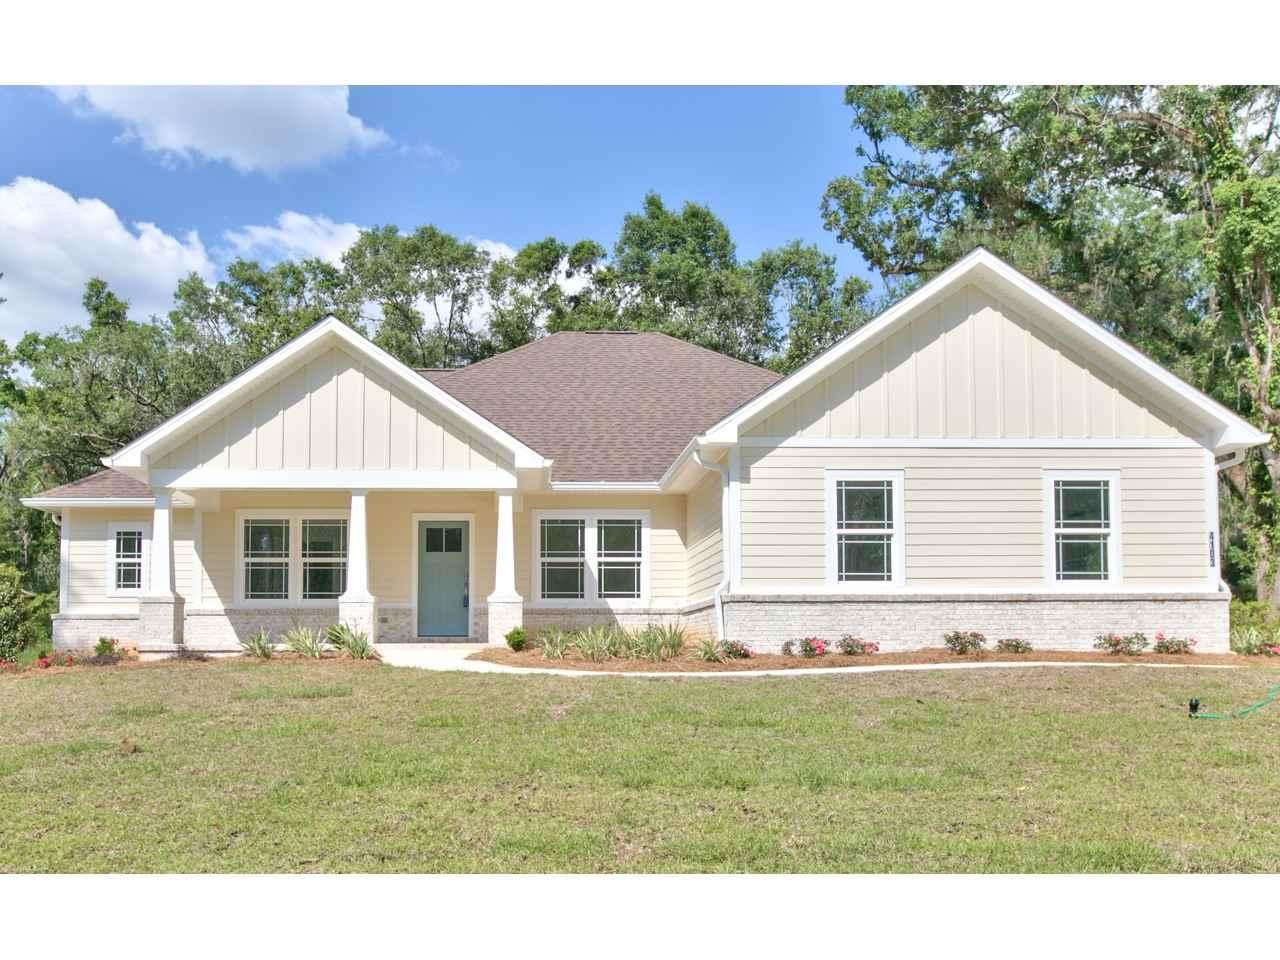 Property ID 301017